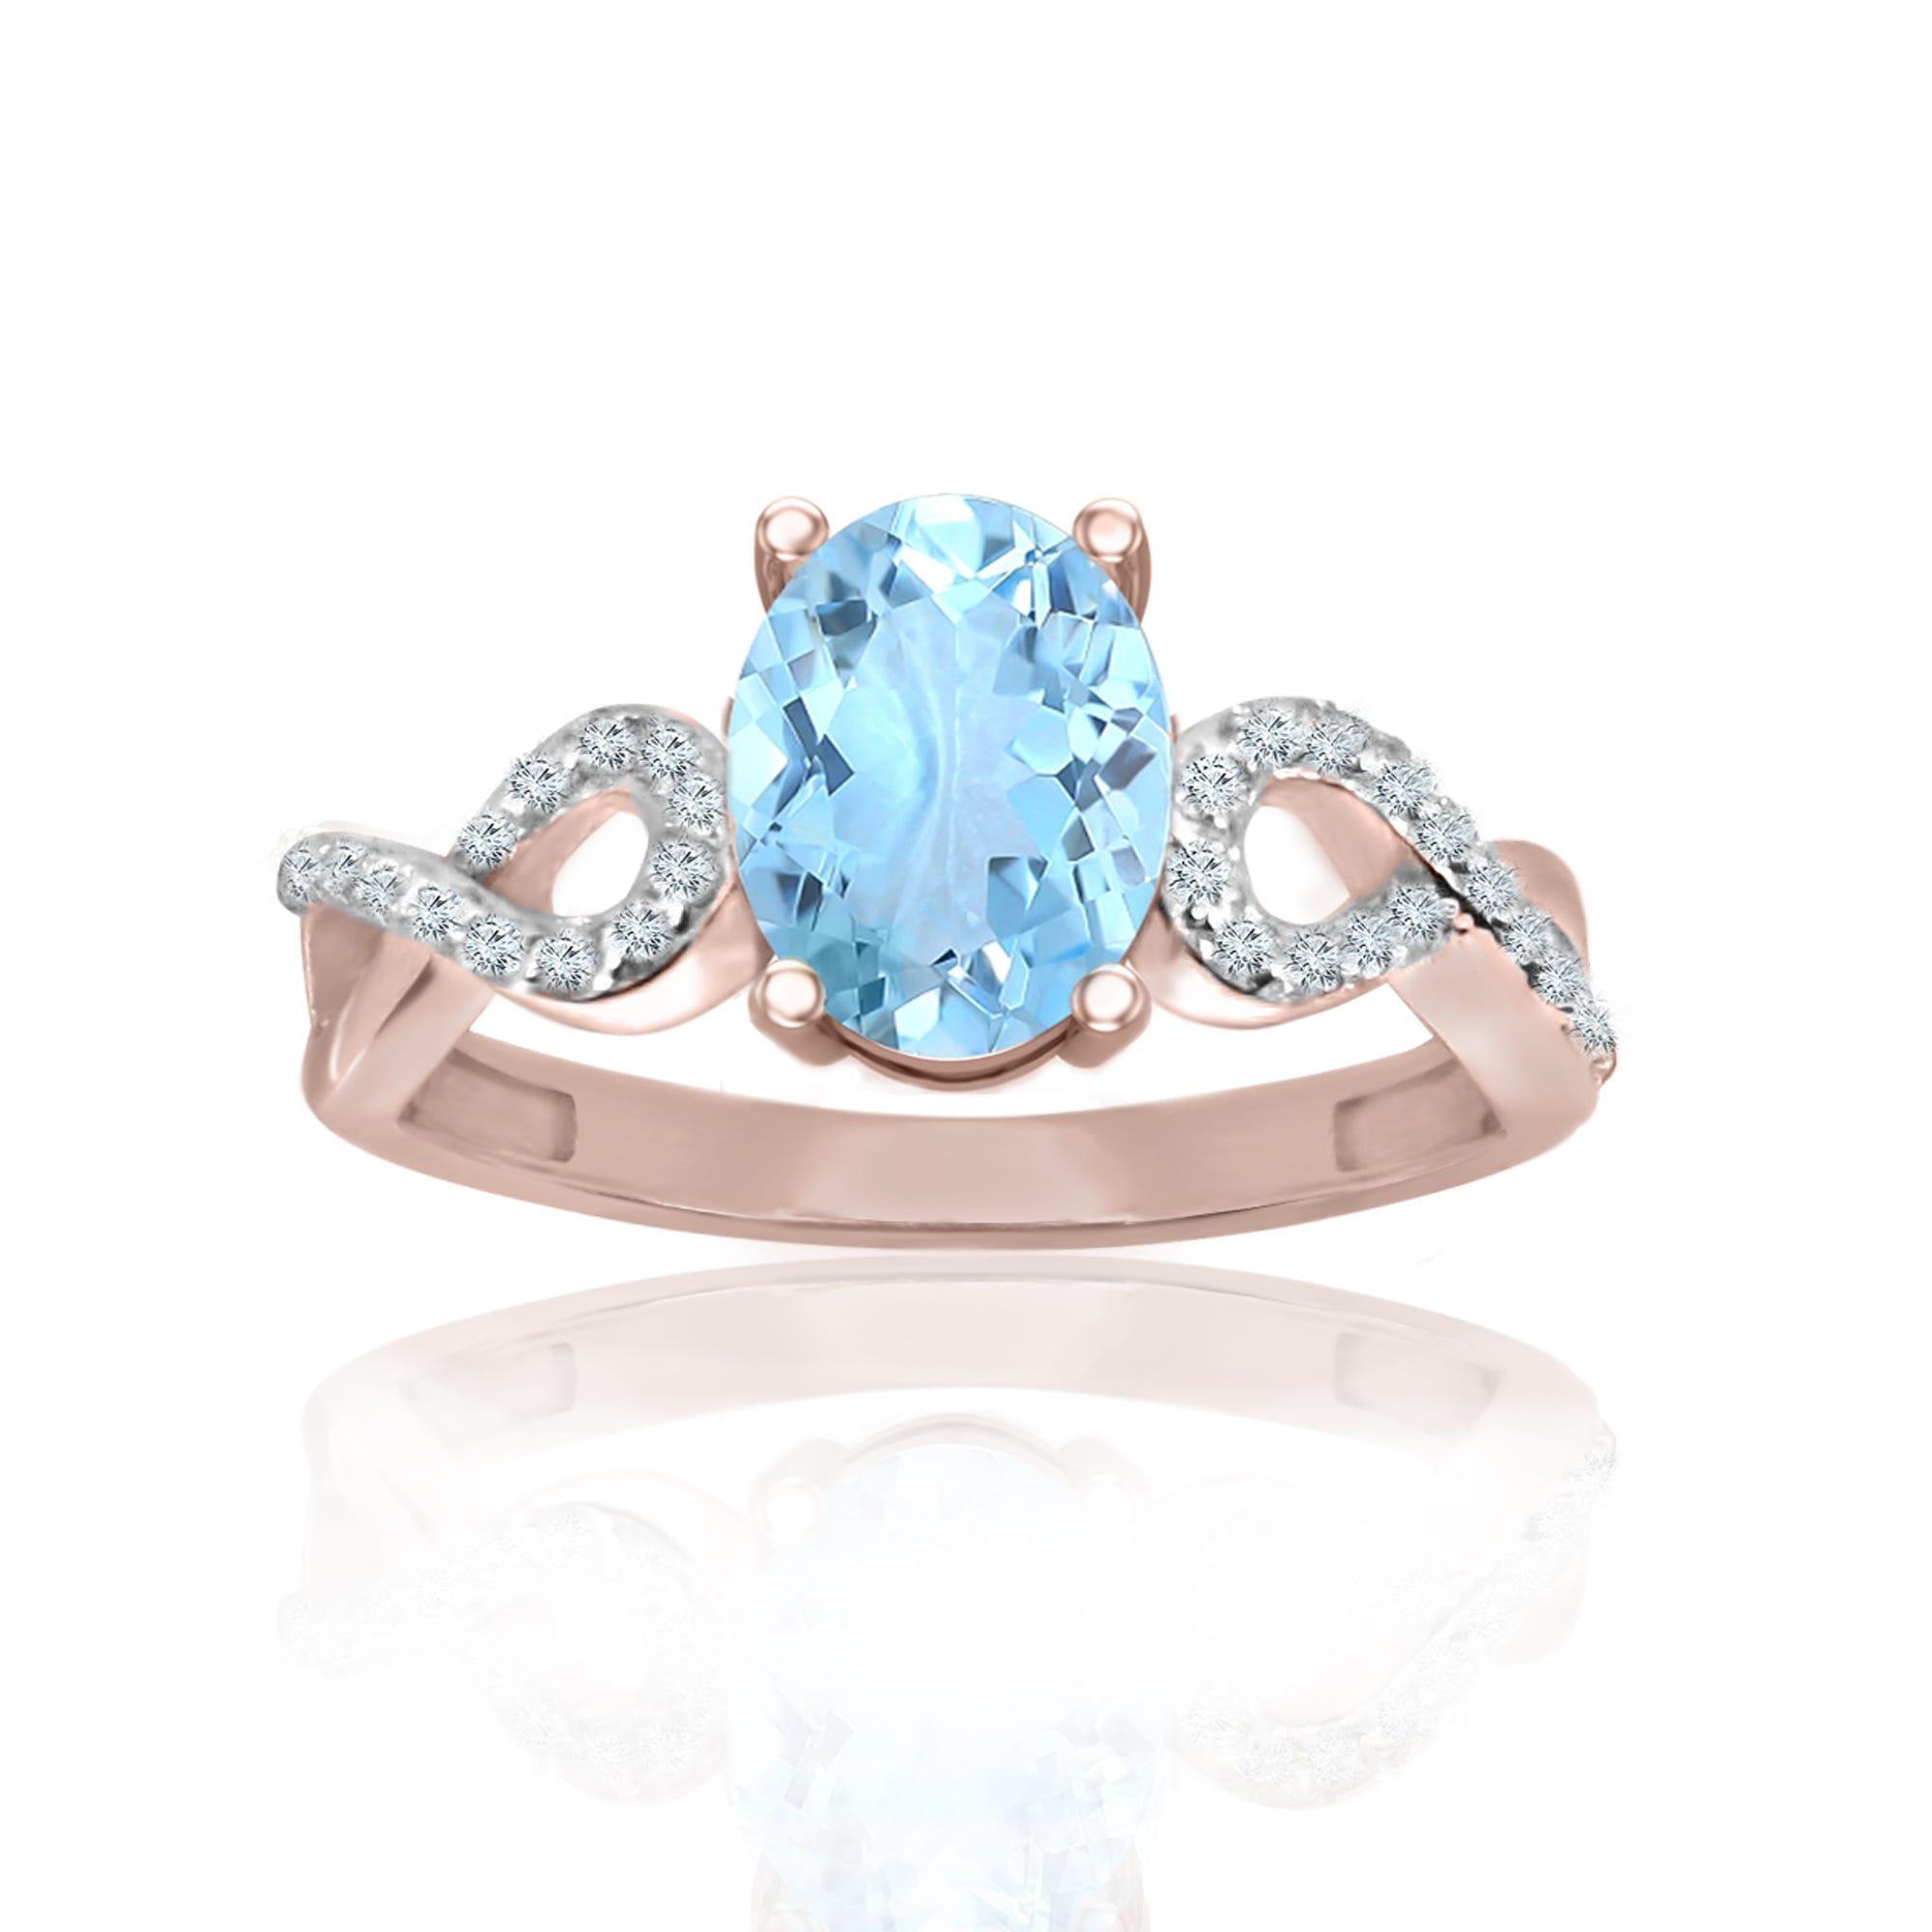 Oval Aquamarine & Diamond Ring in 10k Rose Gold